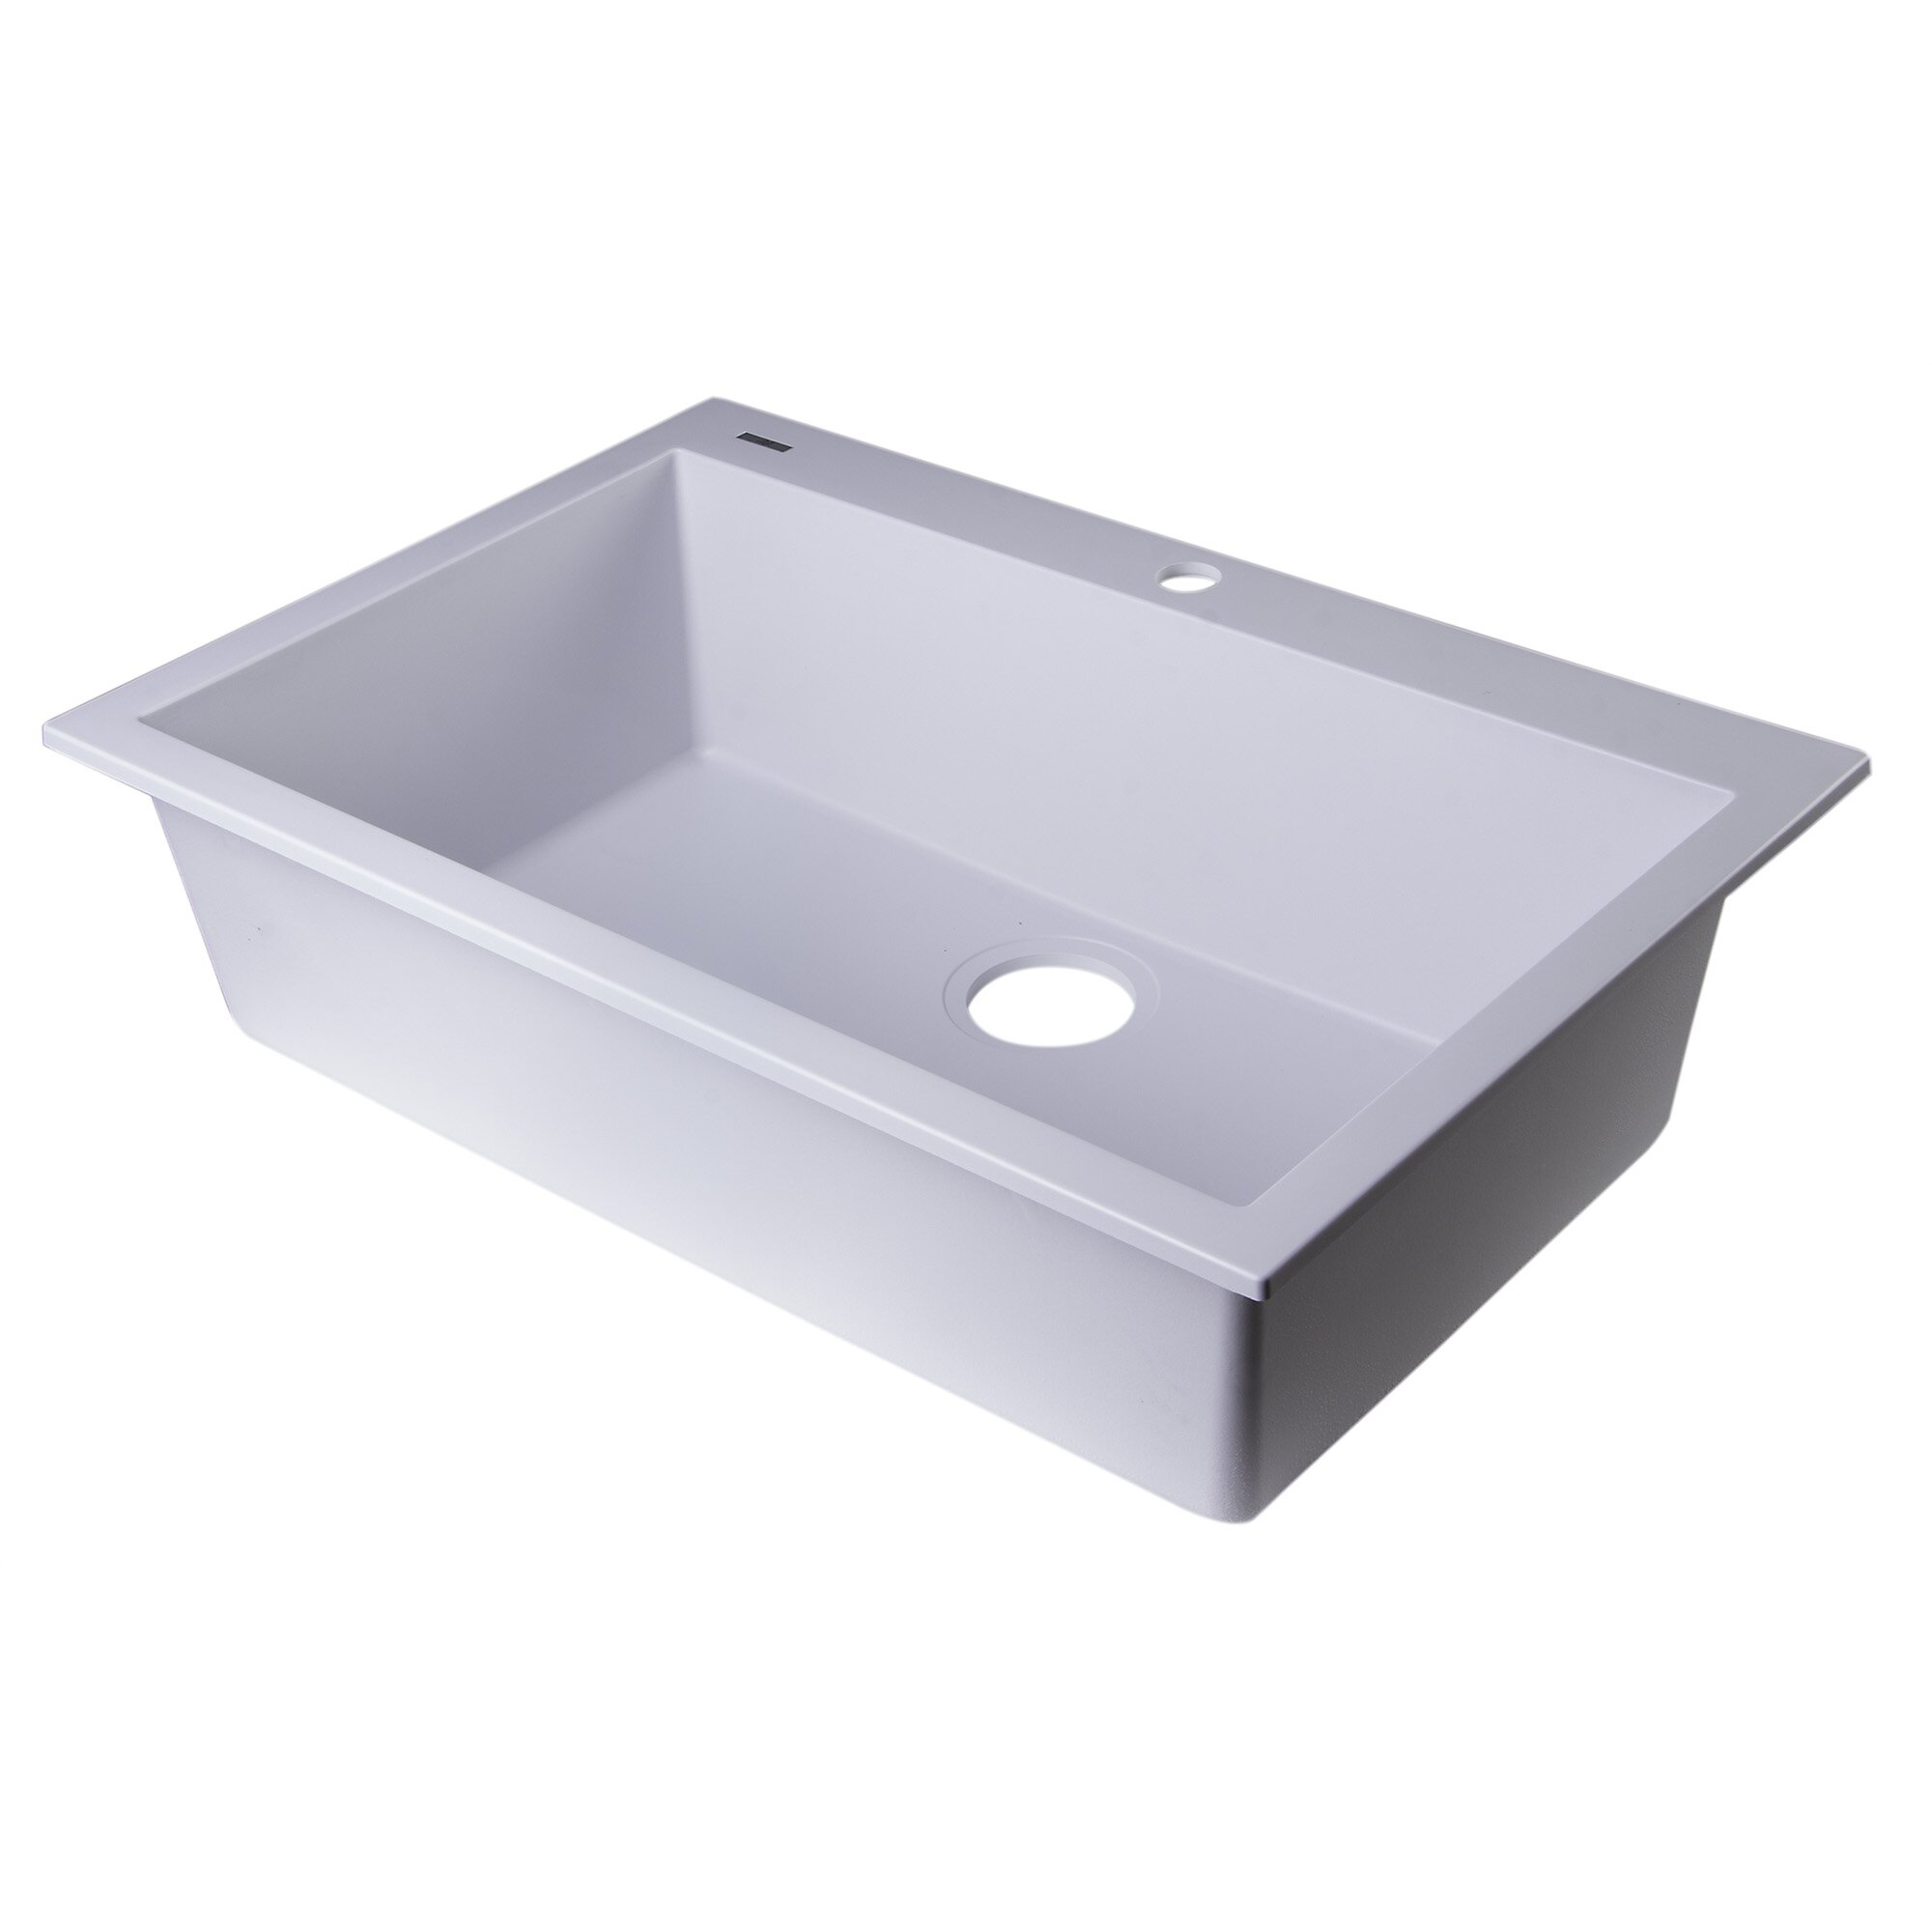 30 x 20 drop in single bowl kitchen sink - Kitchen Sink Drop In